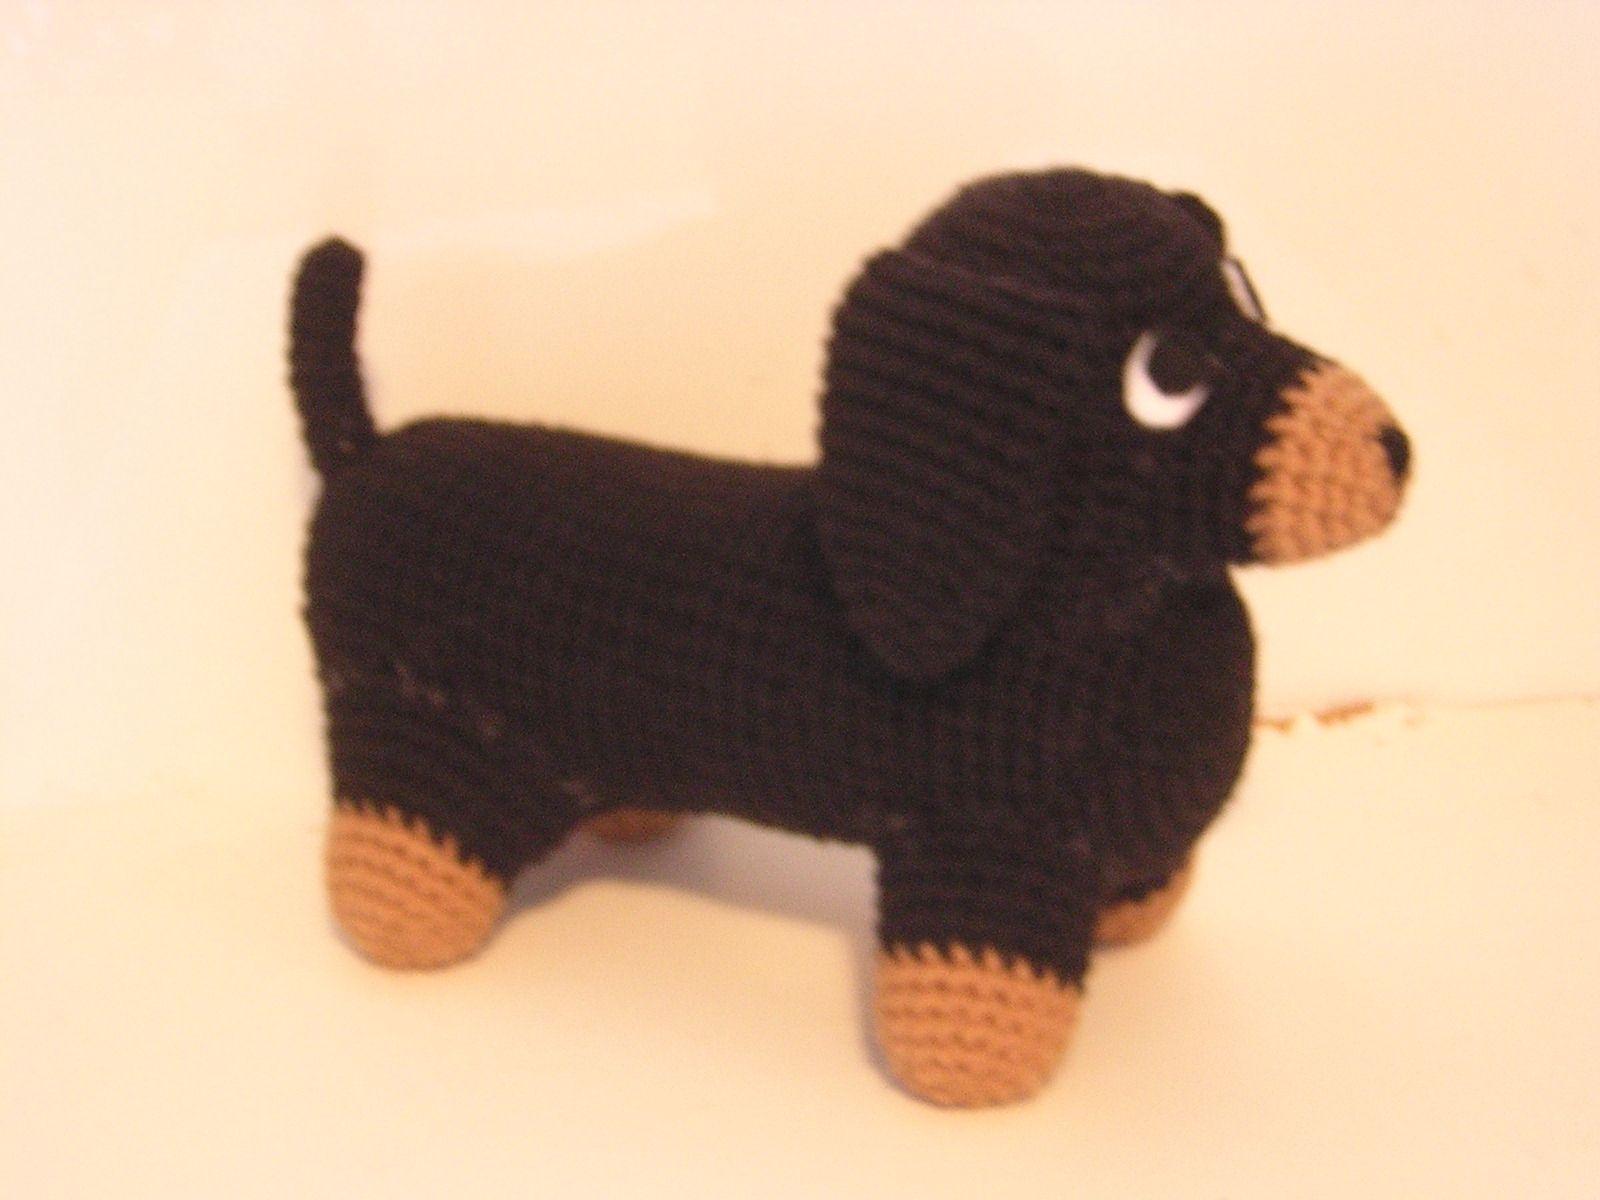 Free Amigurumi Dachshund Pattern : Gratis free dachshund amigurumi crochet pattern supplies one skein